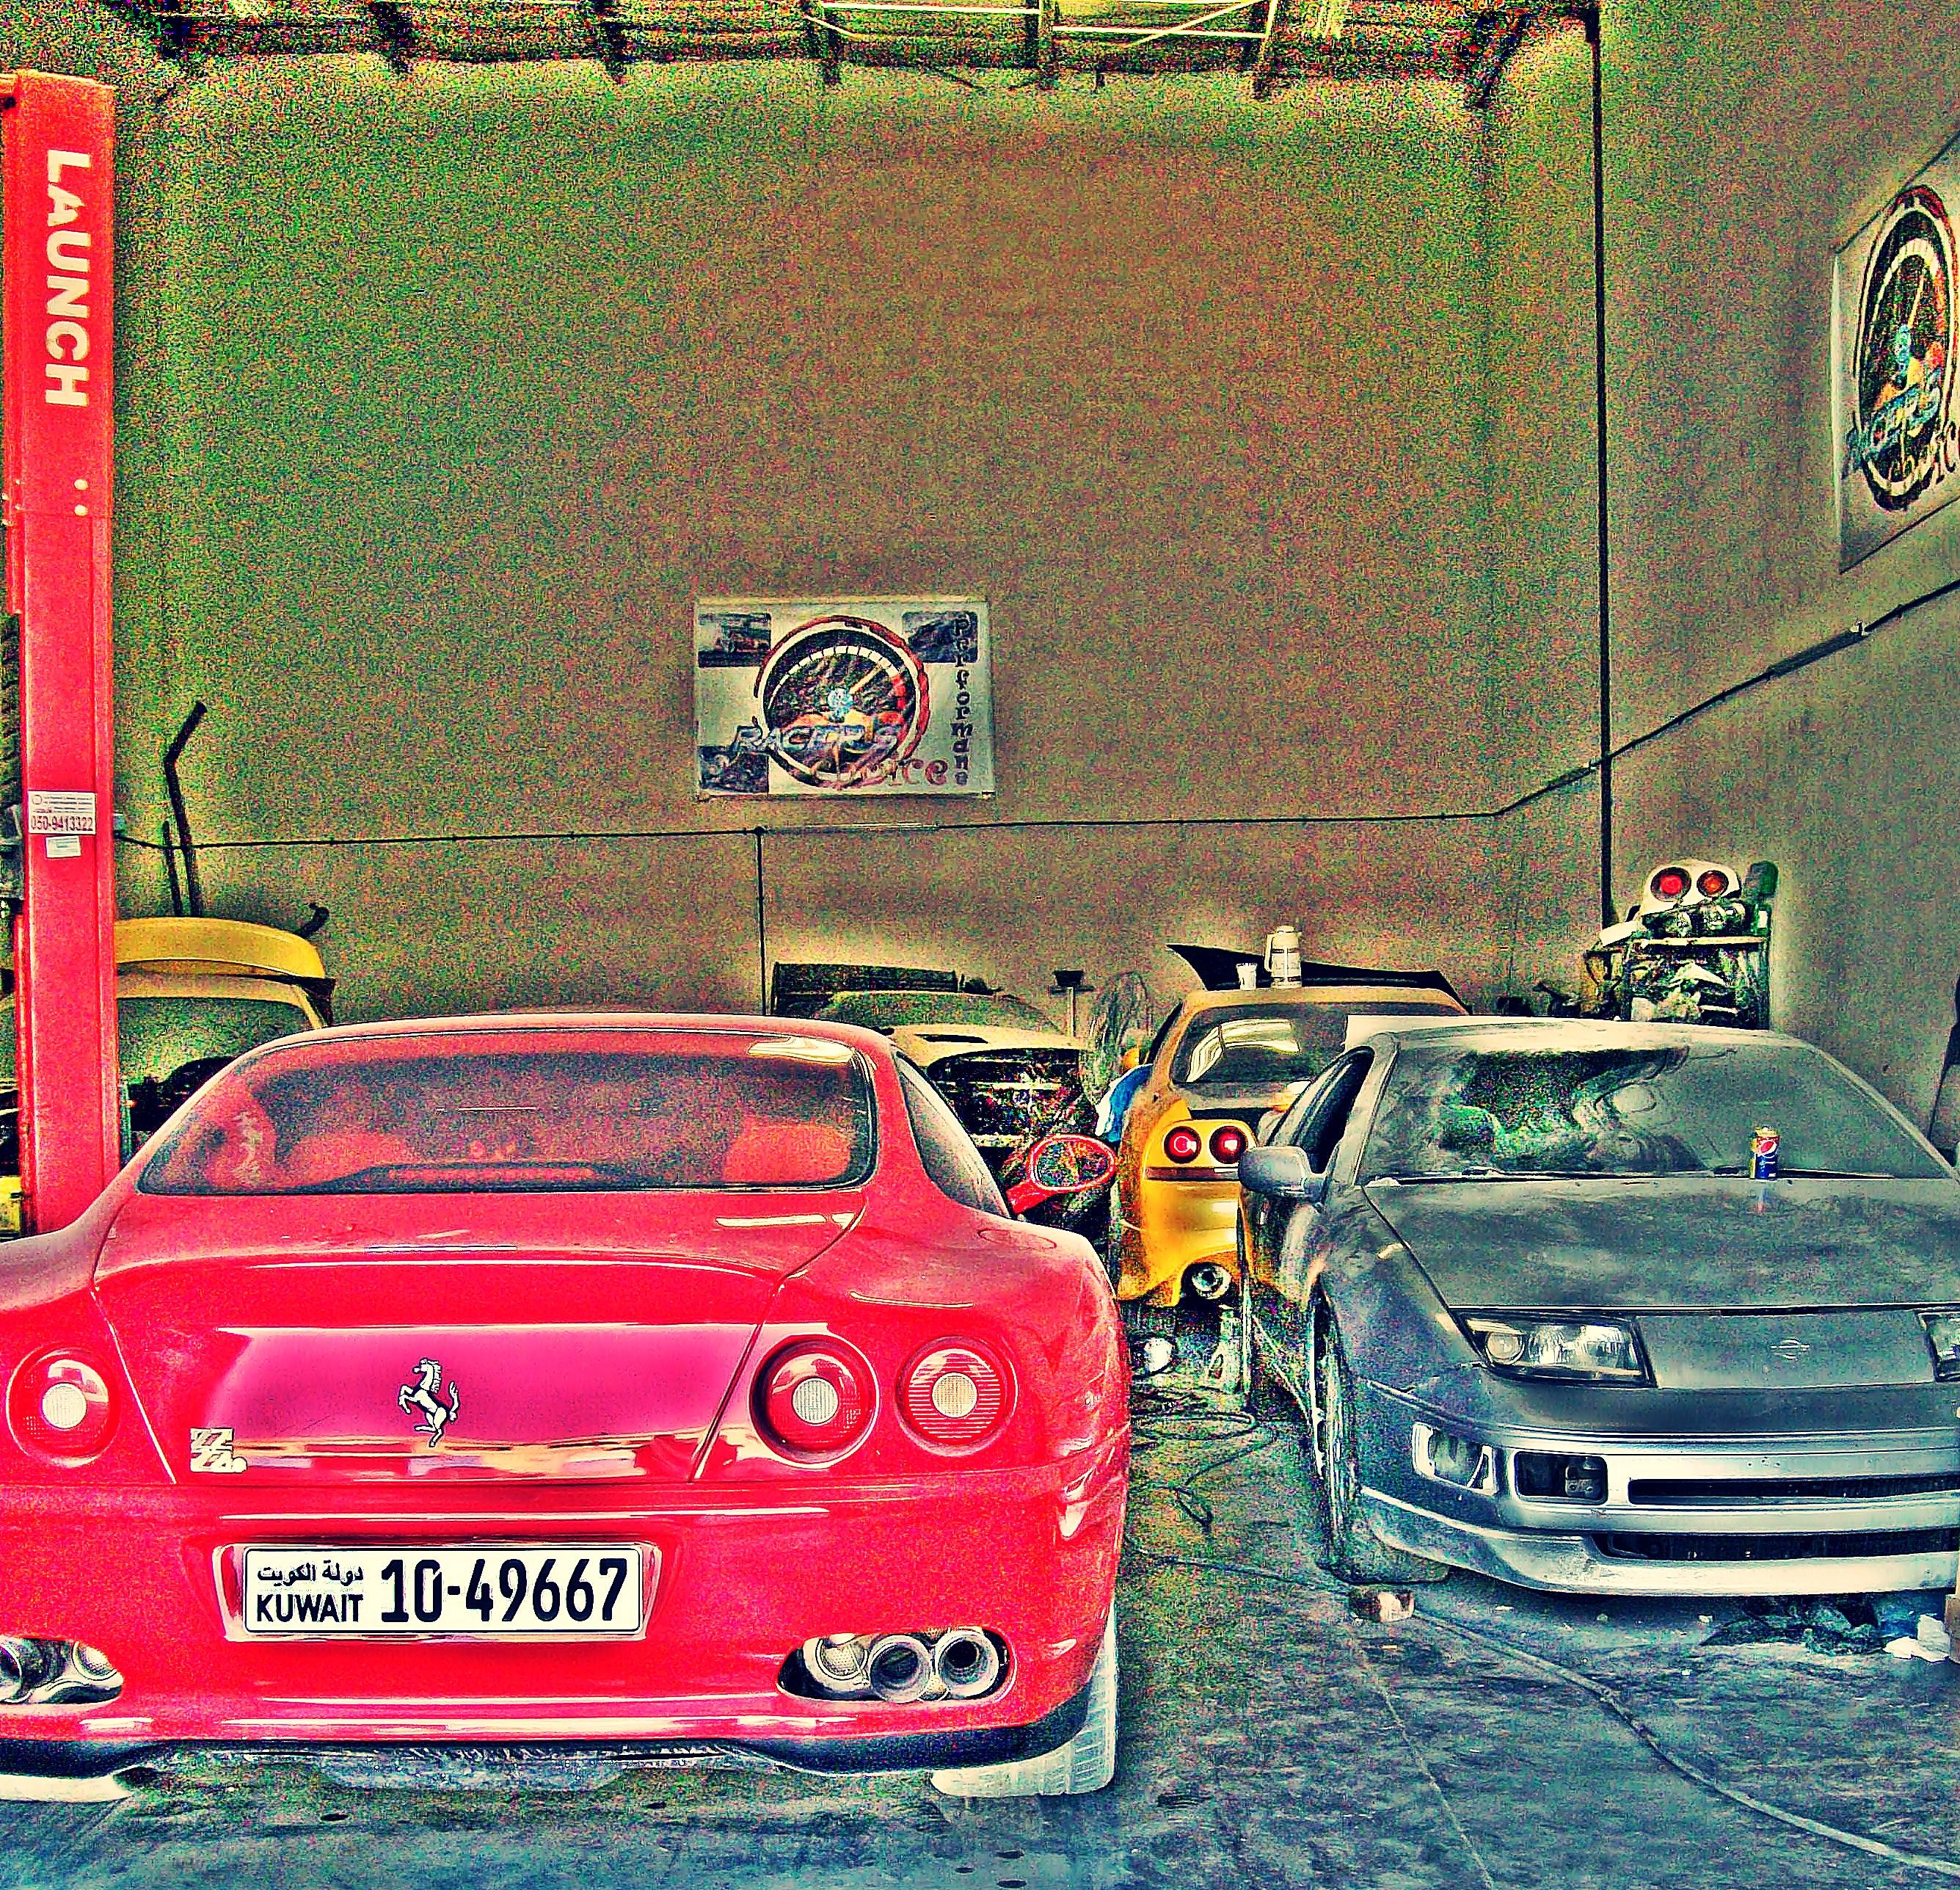 File:RACER'S CHOICE GARAGE -SHARJAH - UAE - panoramio jpg